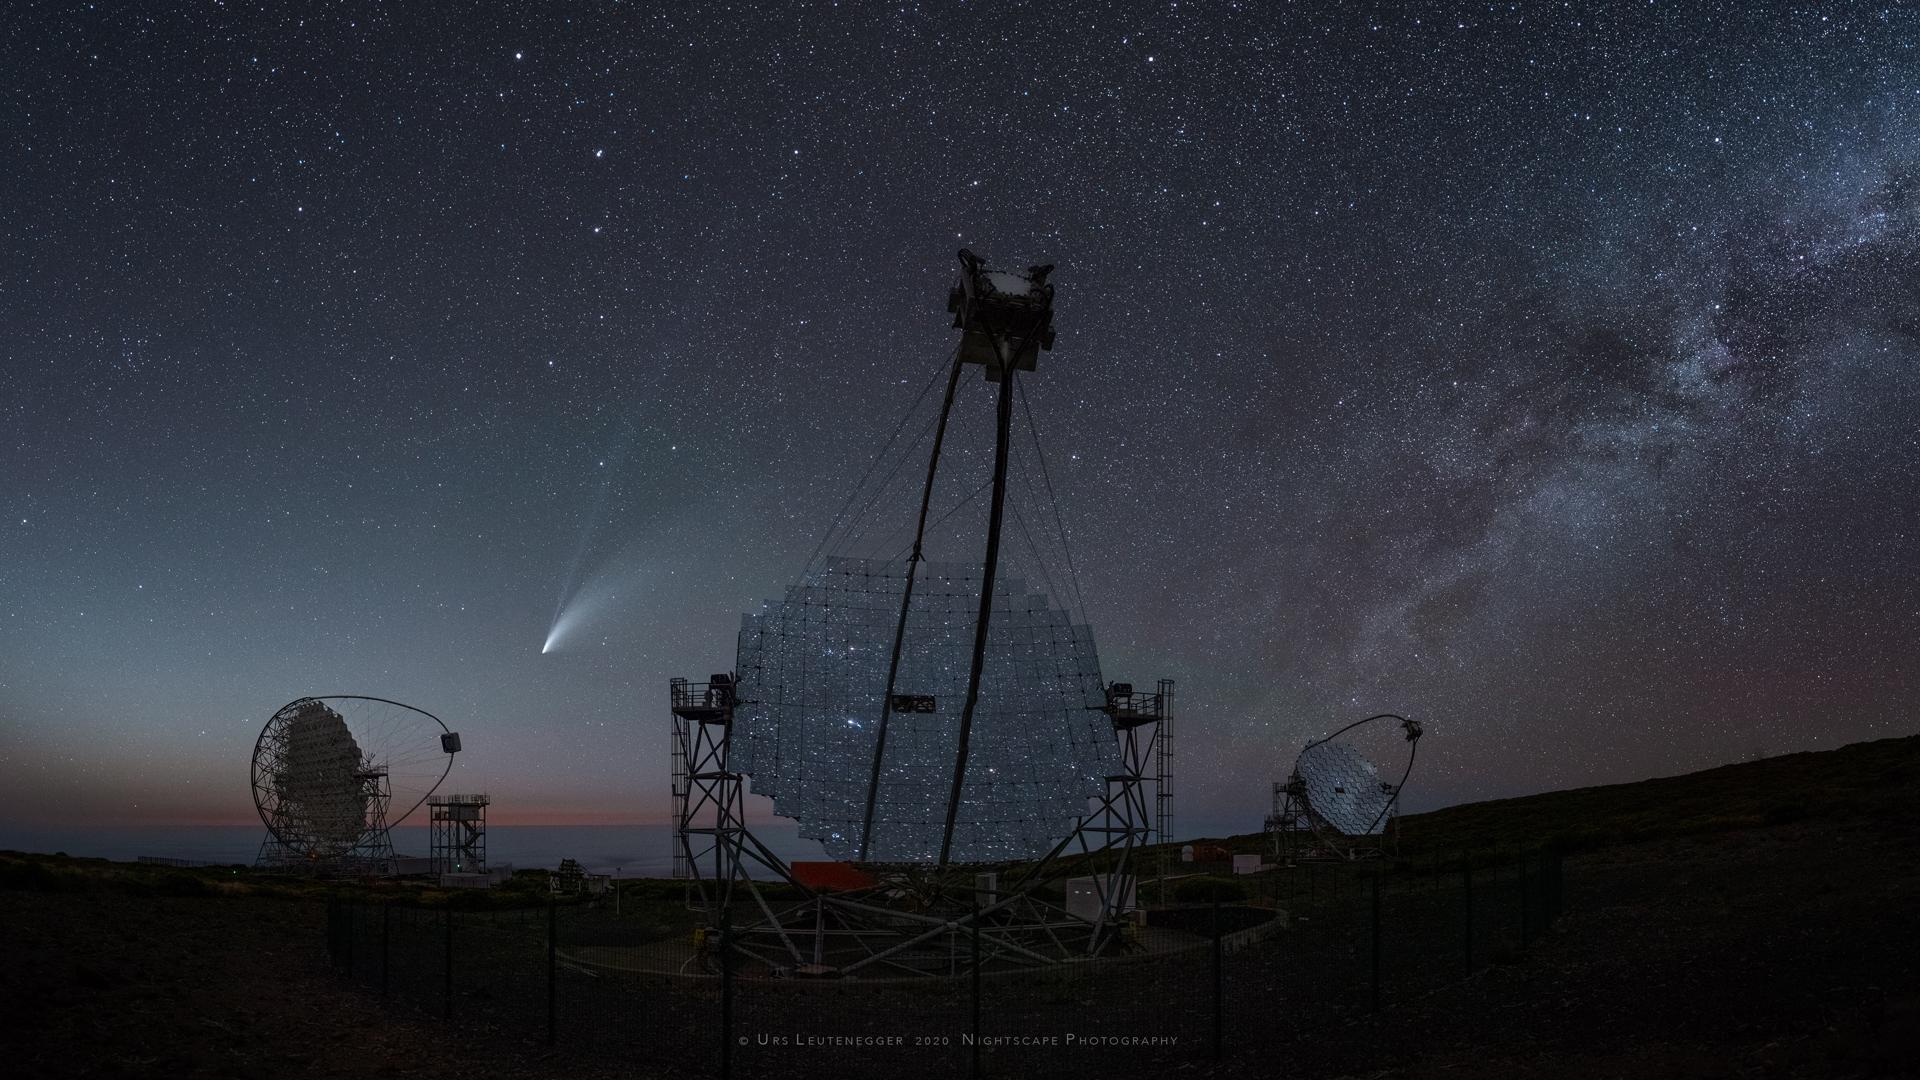 Komet Neowise © Urs Leutenegger auf La Palma, Kanarische Inseln